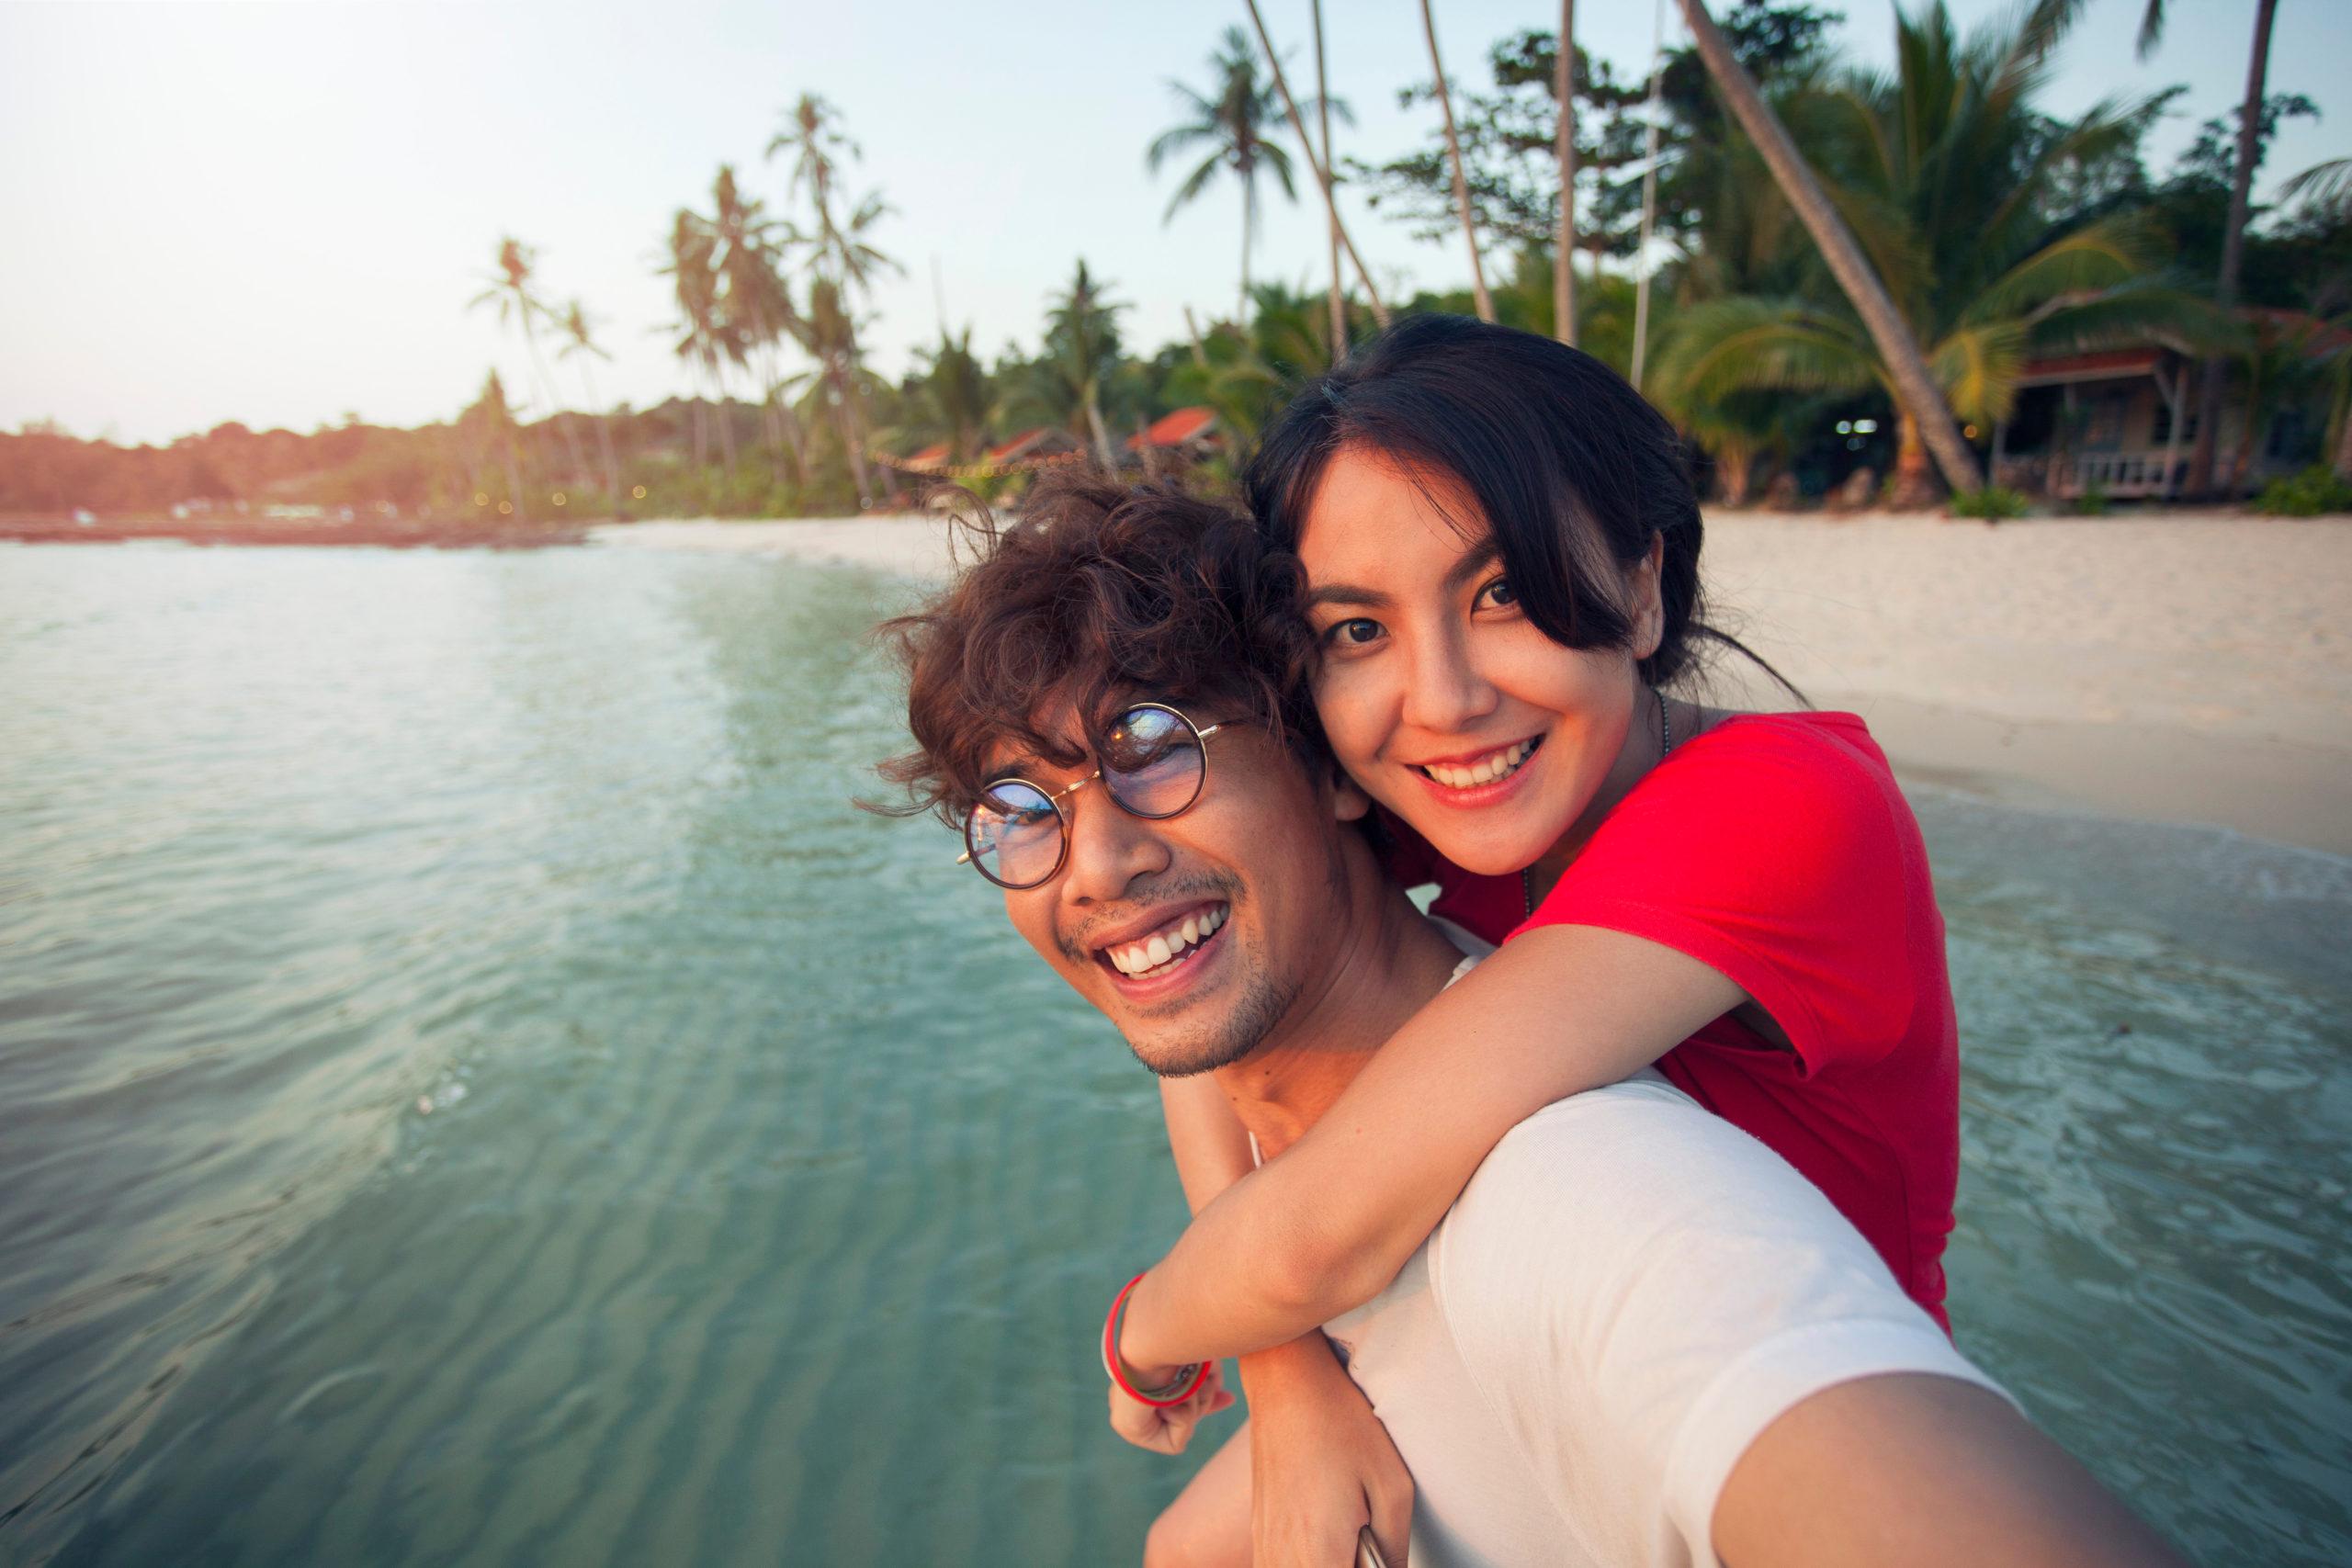 couple-traveler-asian-selfie-on-beach-1220653387